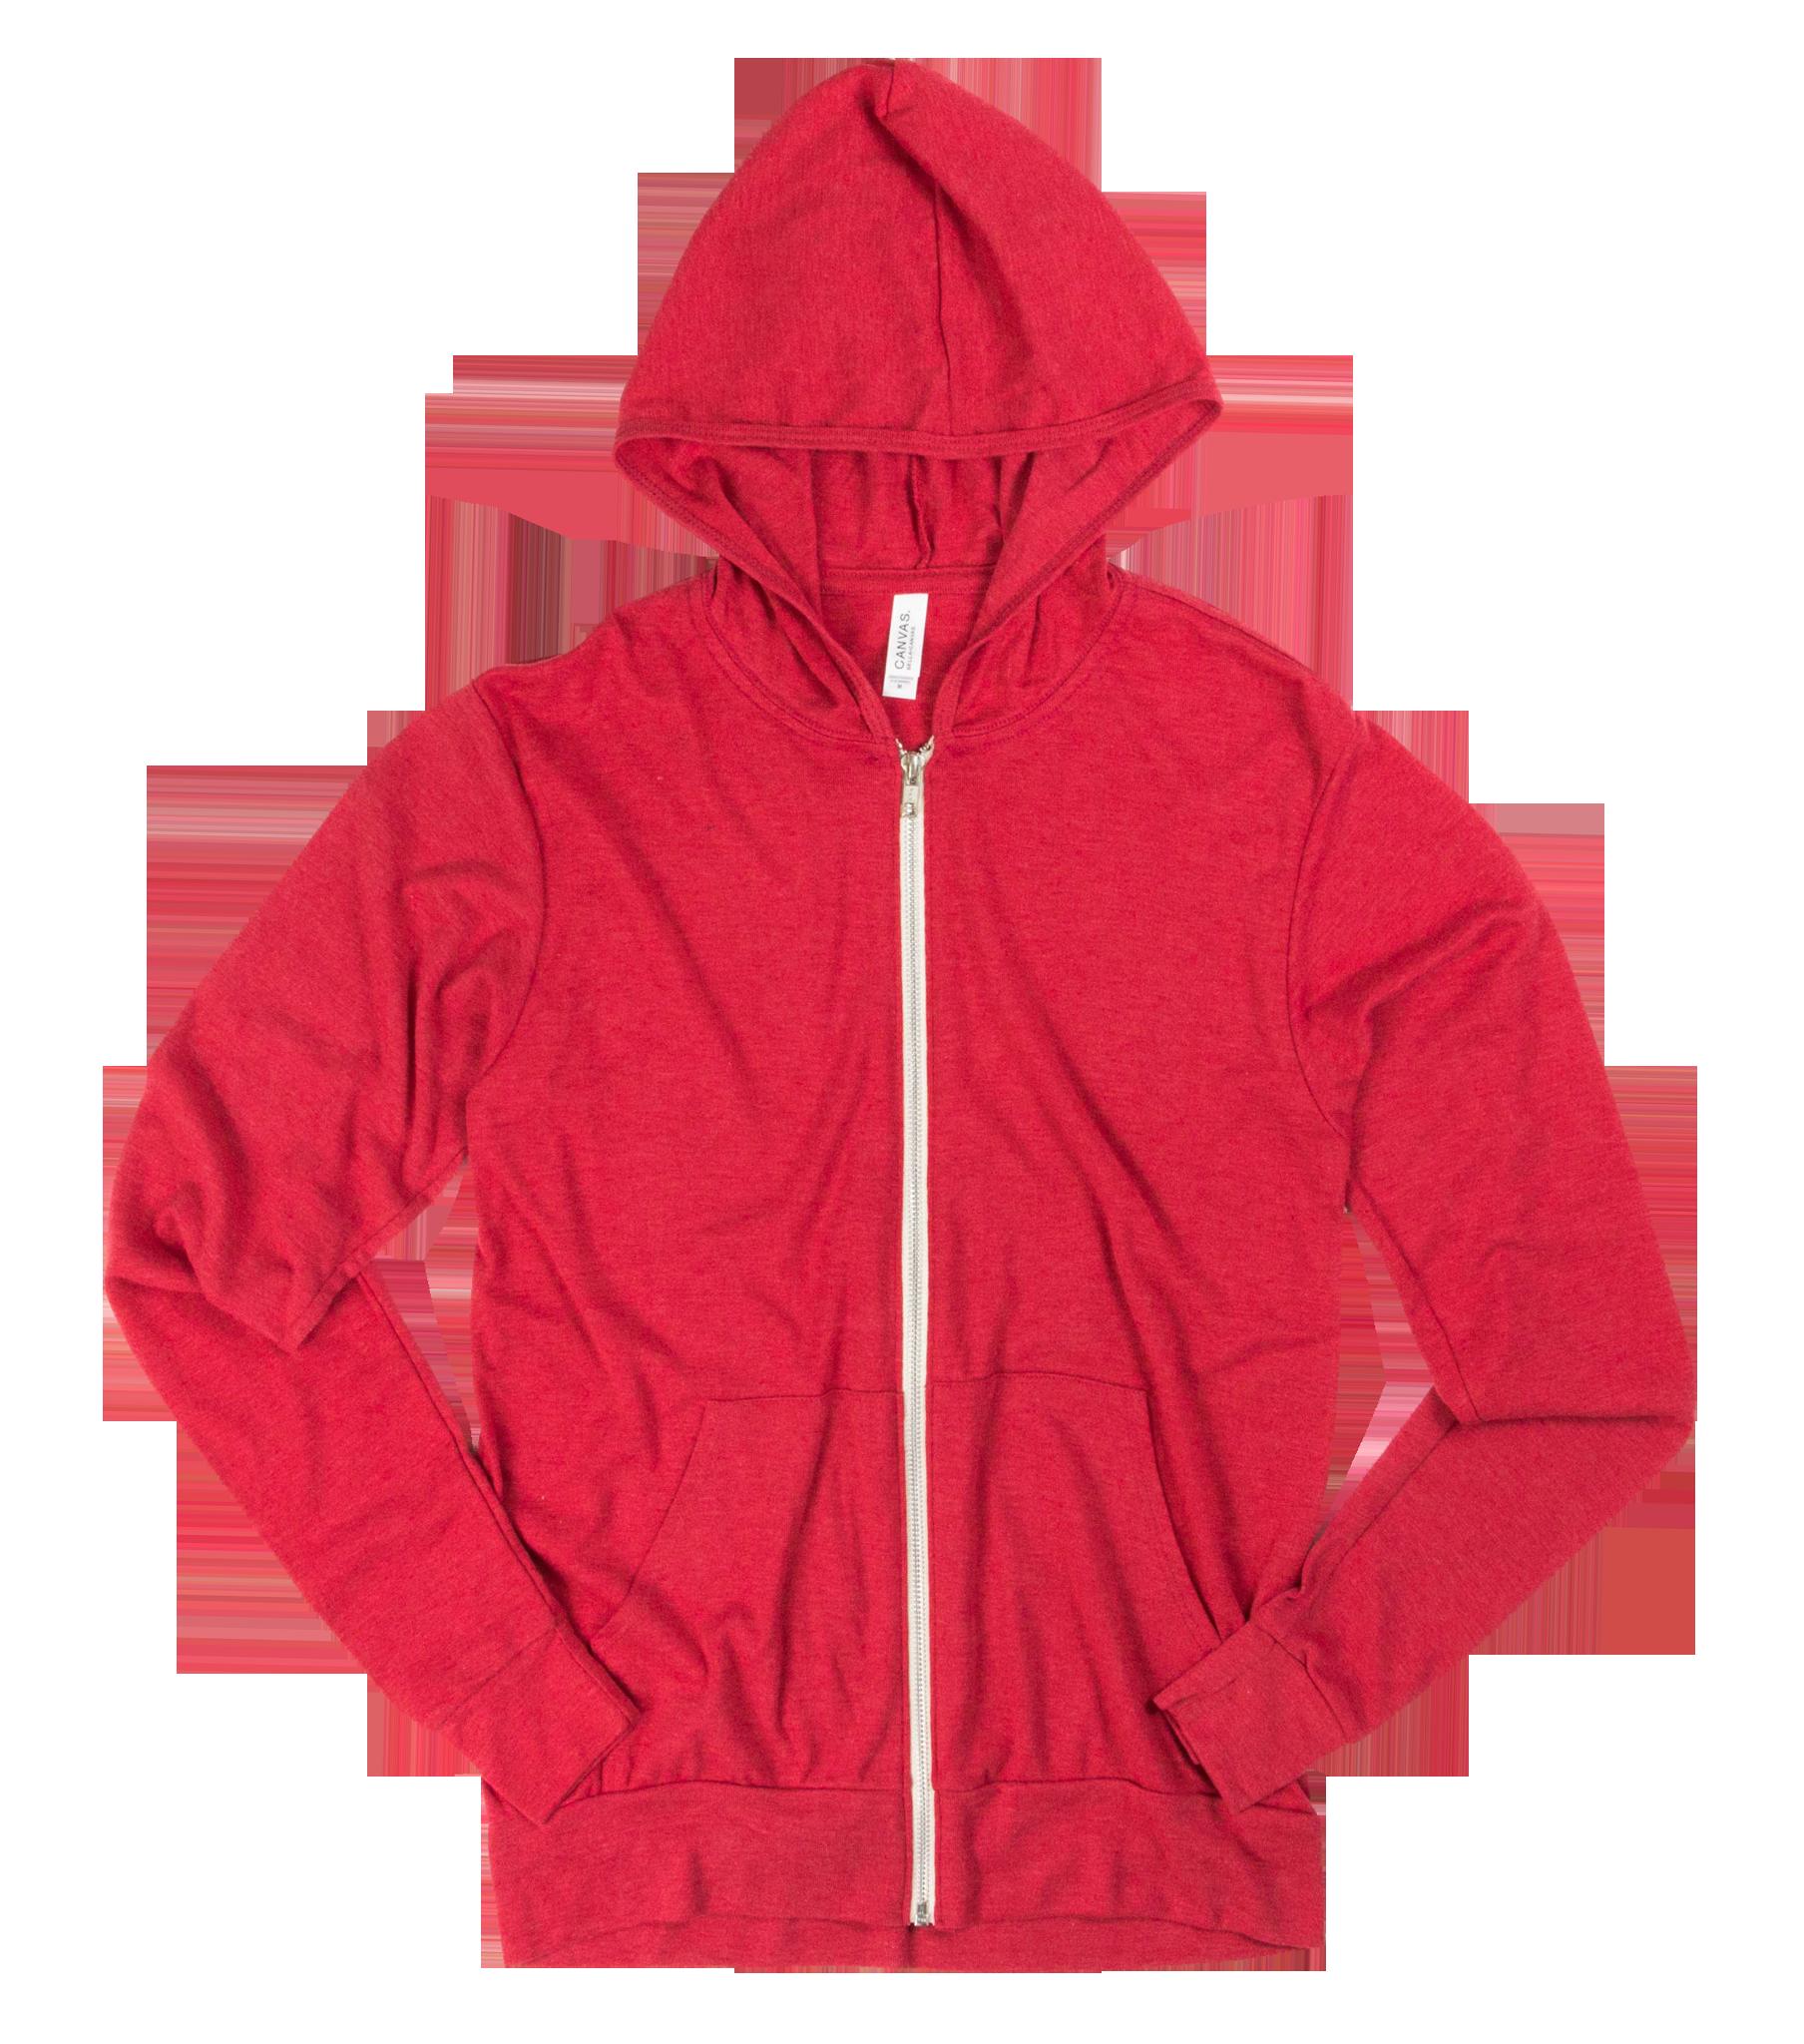 47dabf6d Co-ed Monkey- Custom Canvas 50/ 25/ 25 Full Zip Lightweight Hooded T-Shirt  25 @ $29